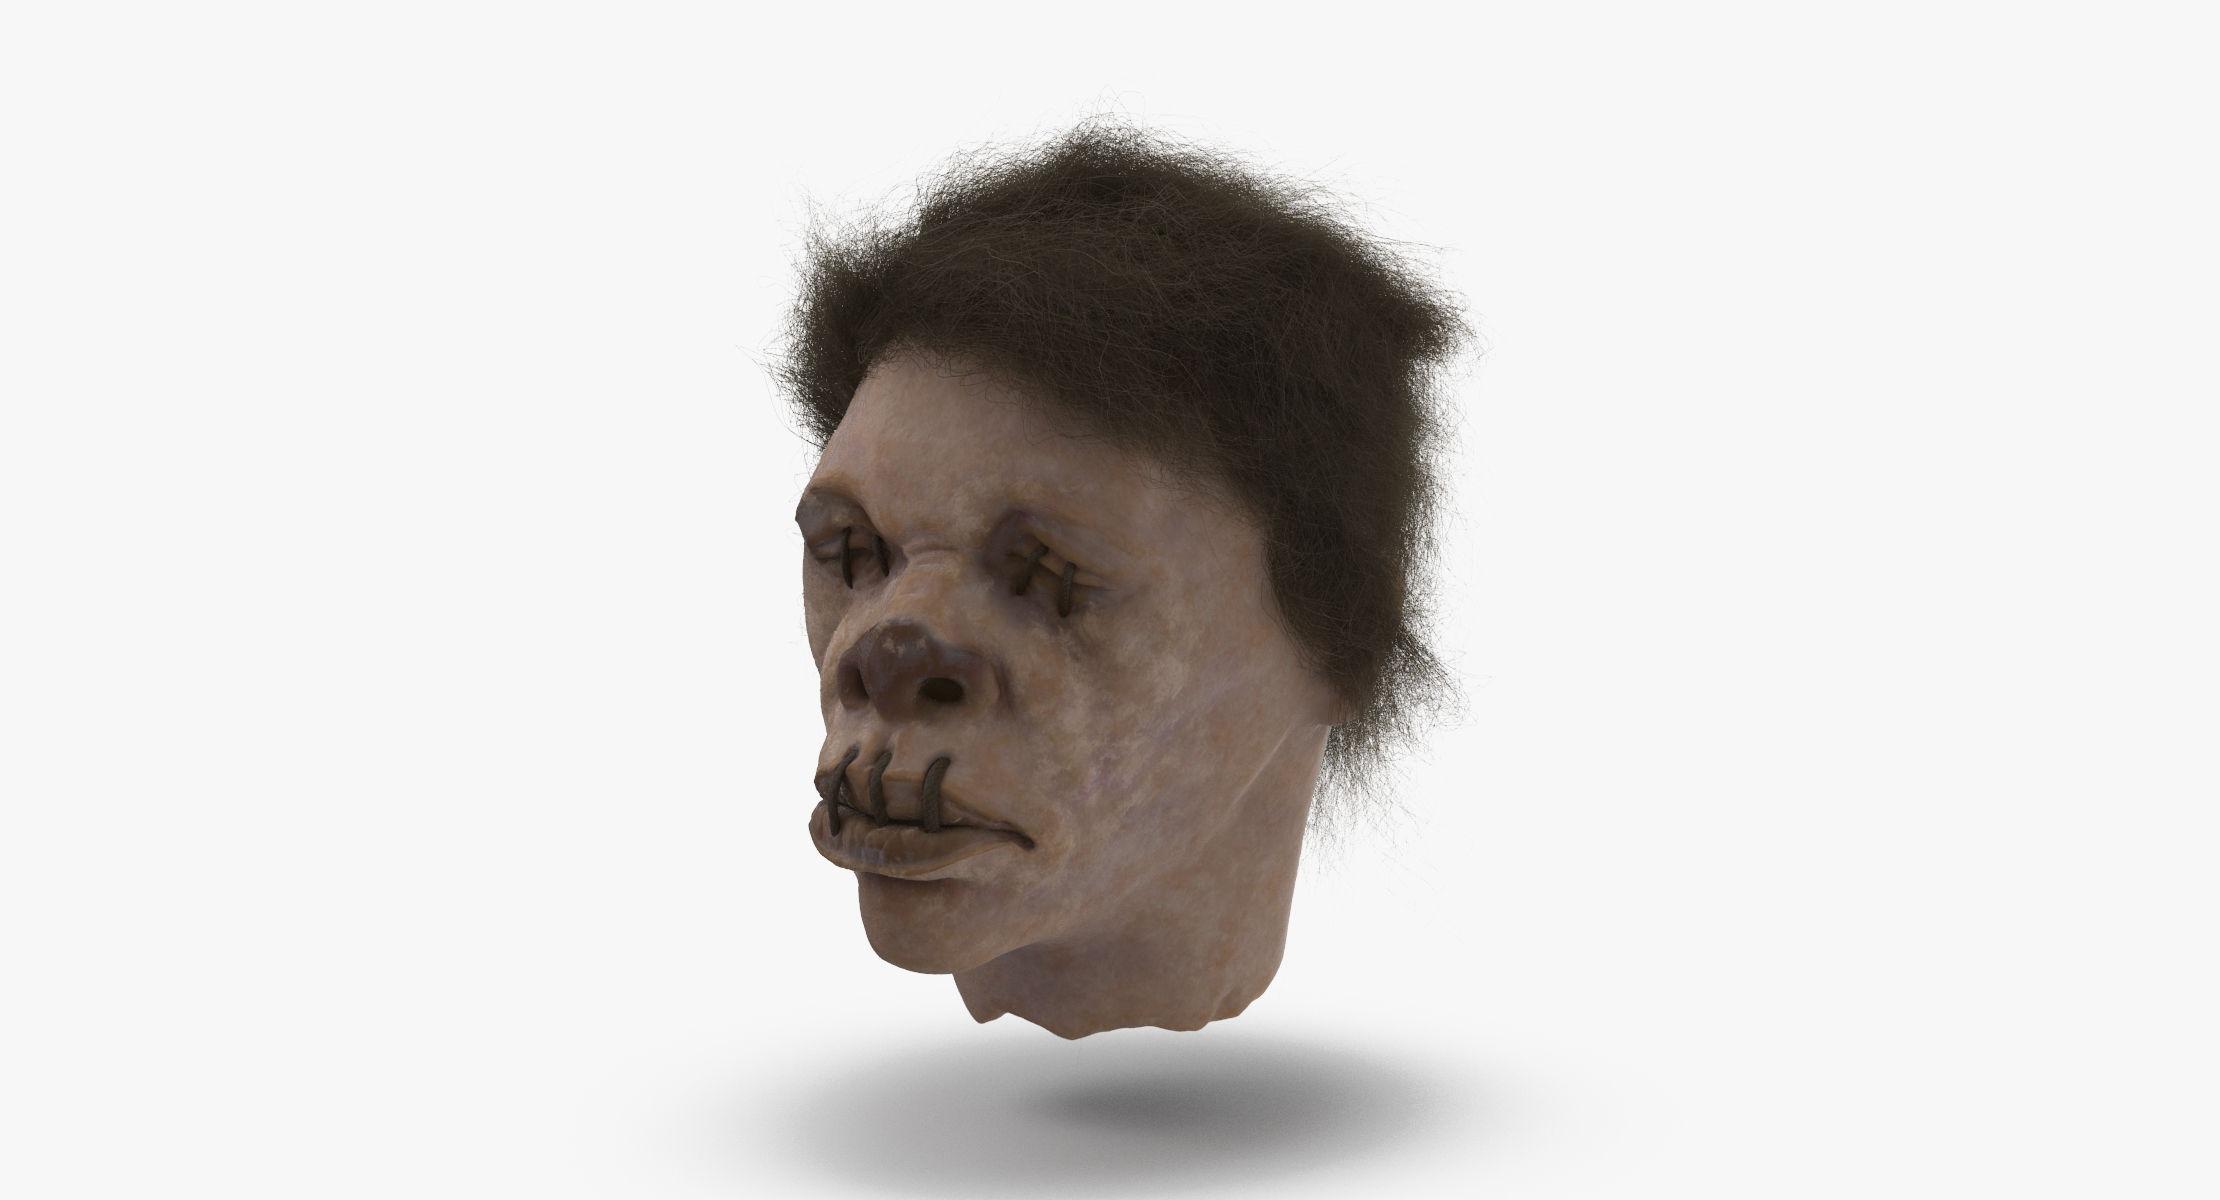 Shrunken Head 03 - reel 1